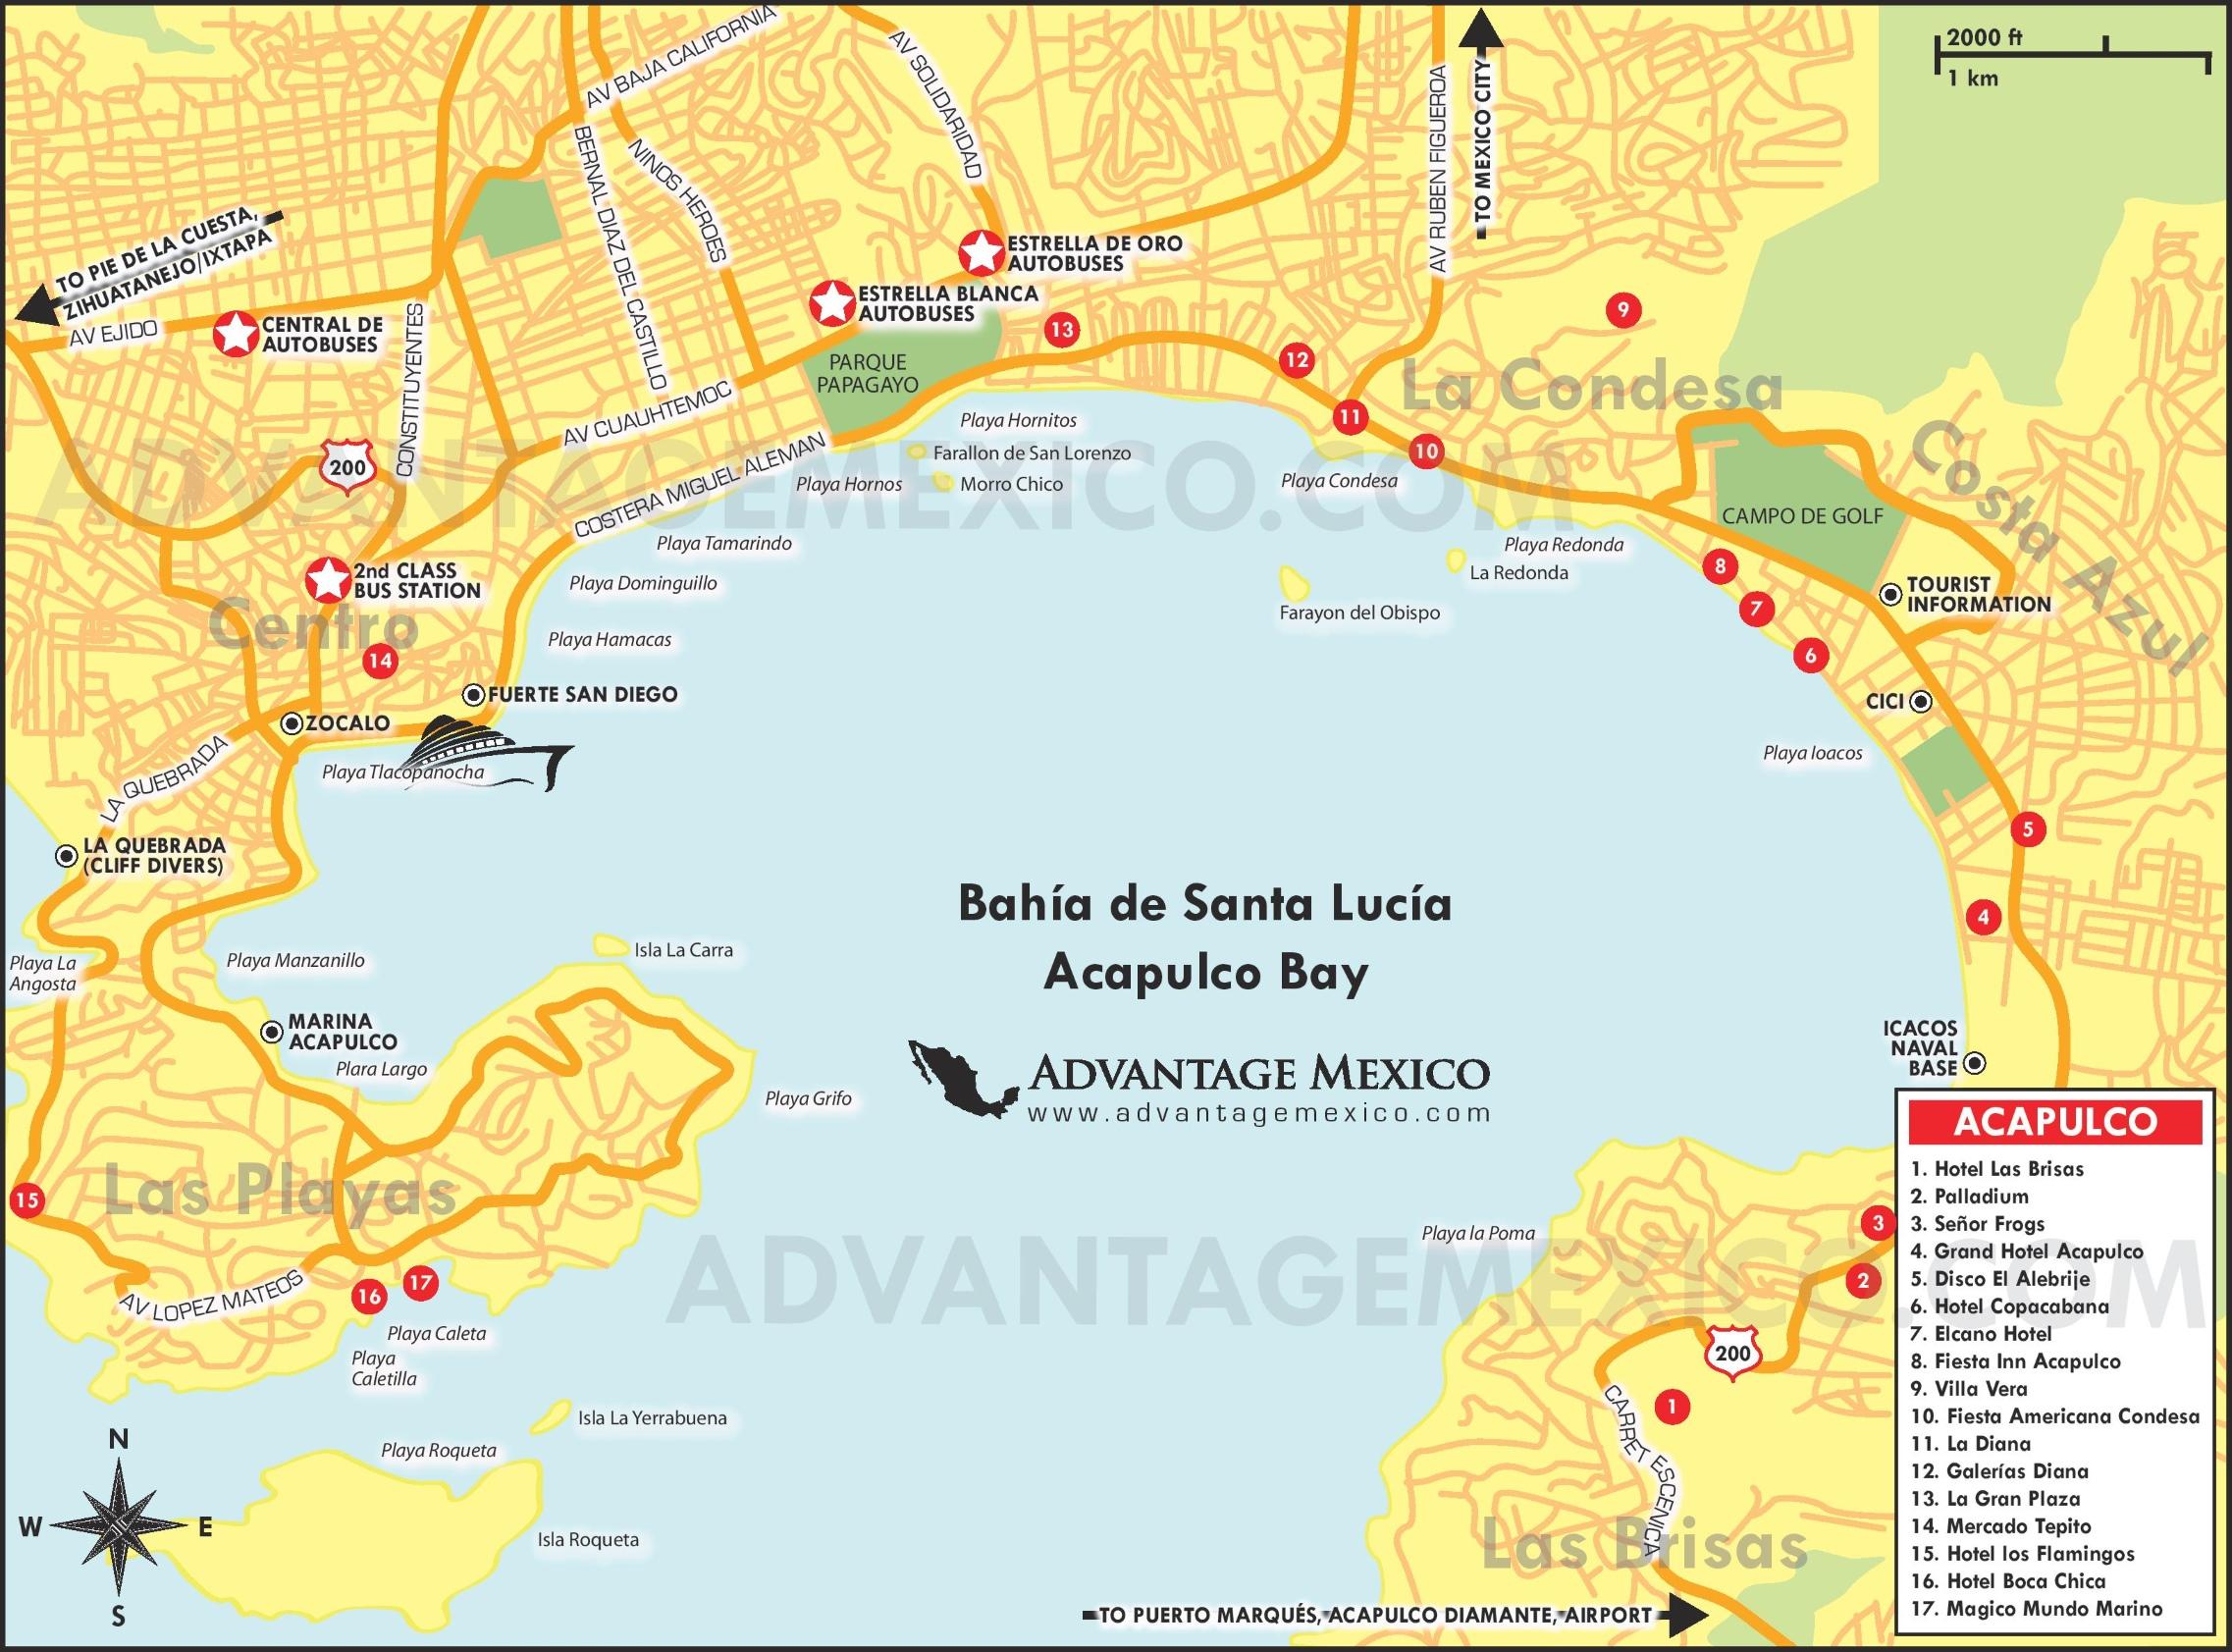 Acapulco hotel map